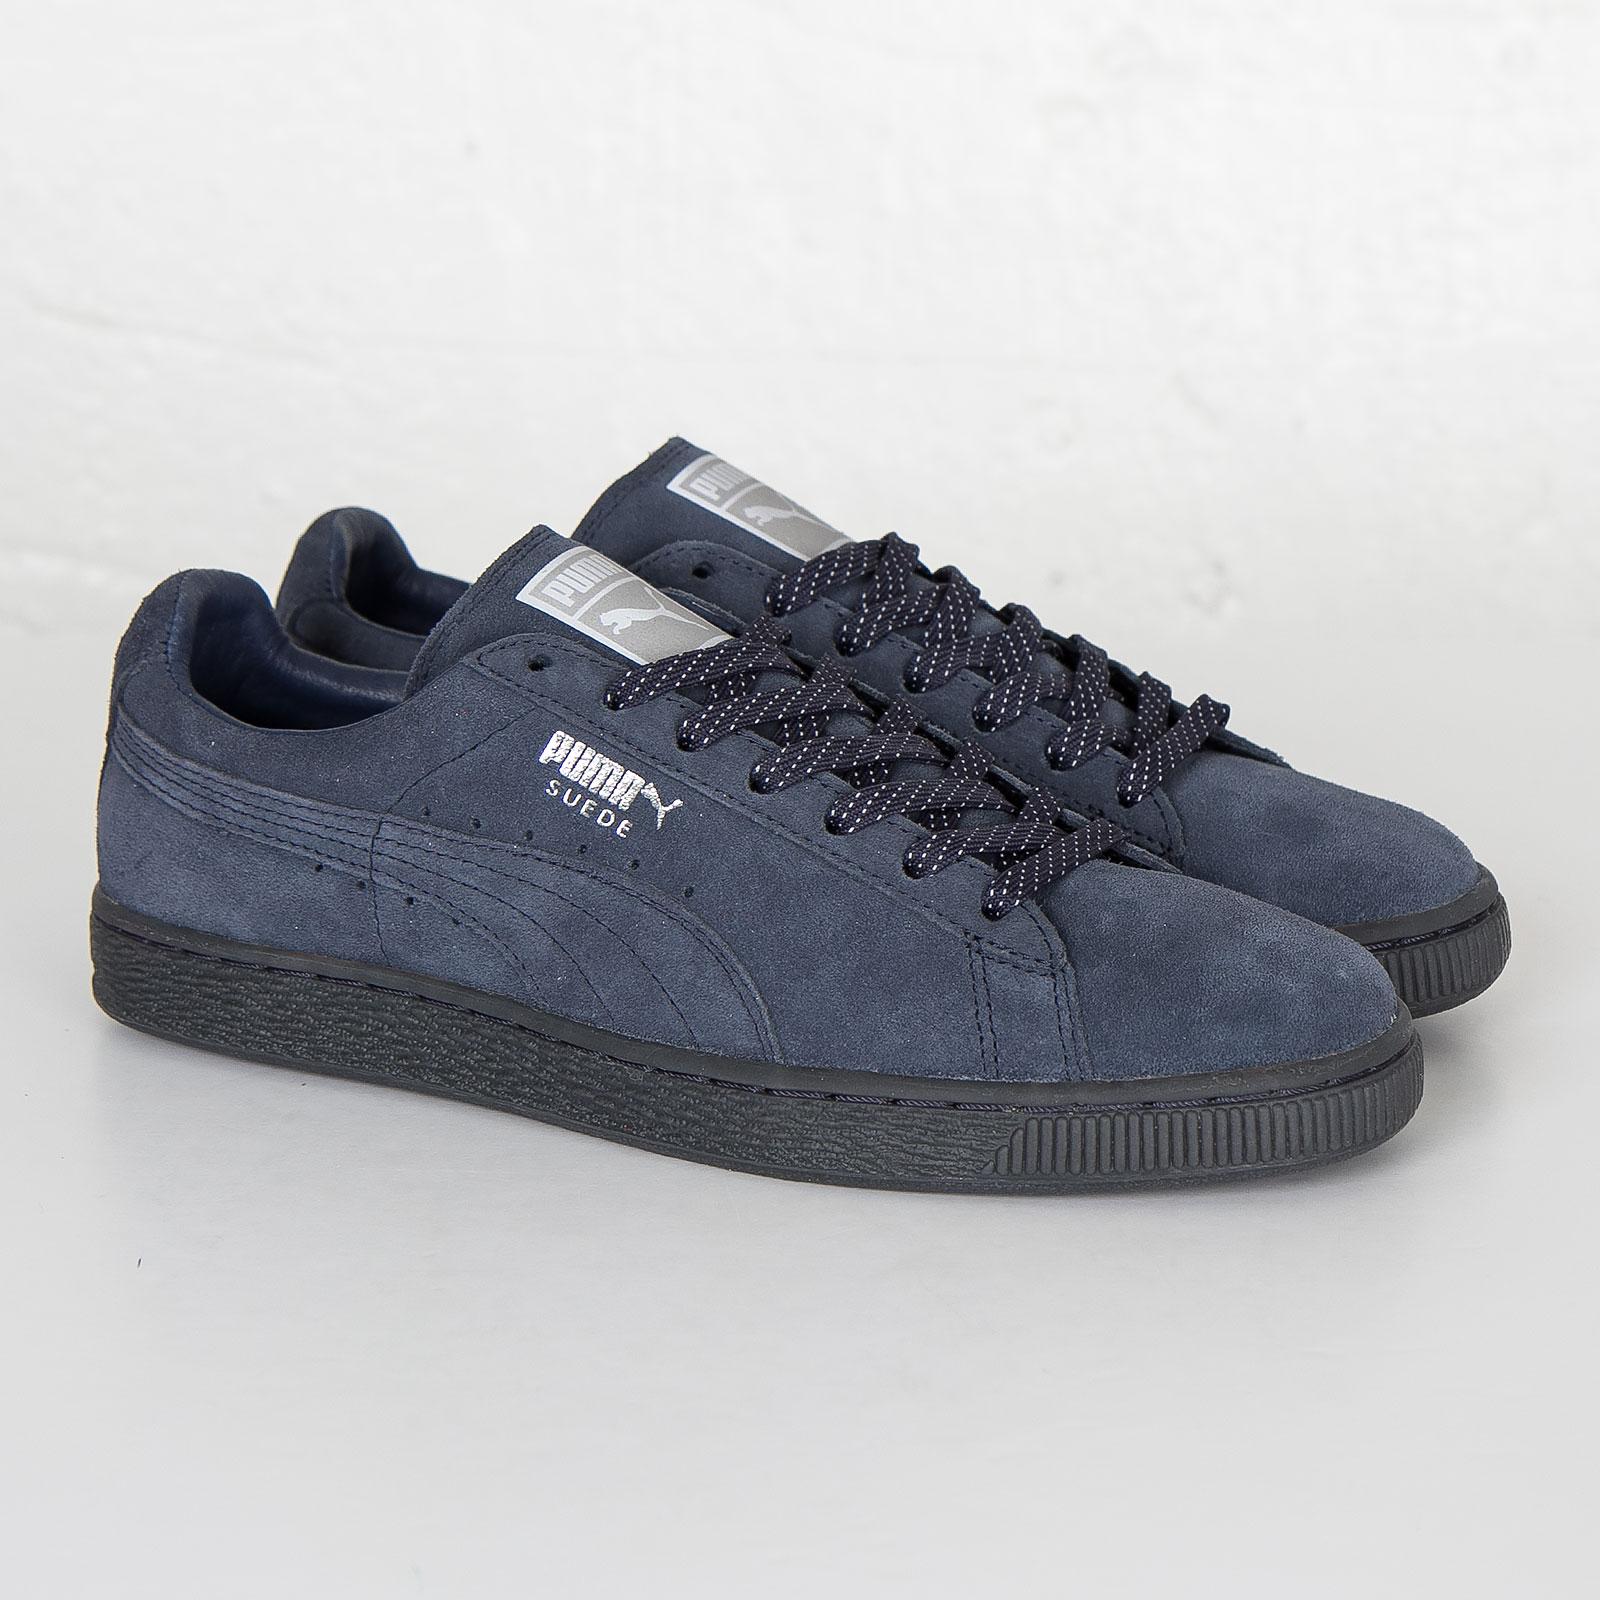 362101 Classic Sneakersnstuff Iced Mono 03 Ref Suede Puma txhdBsQrC